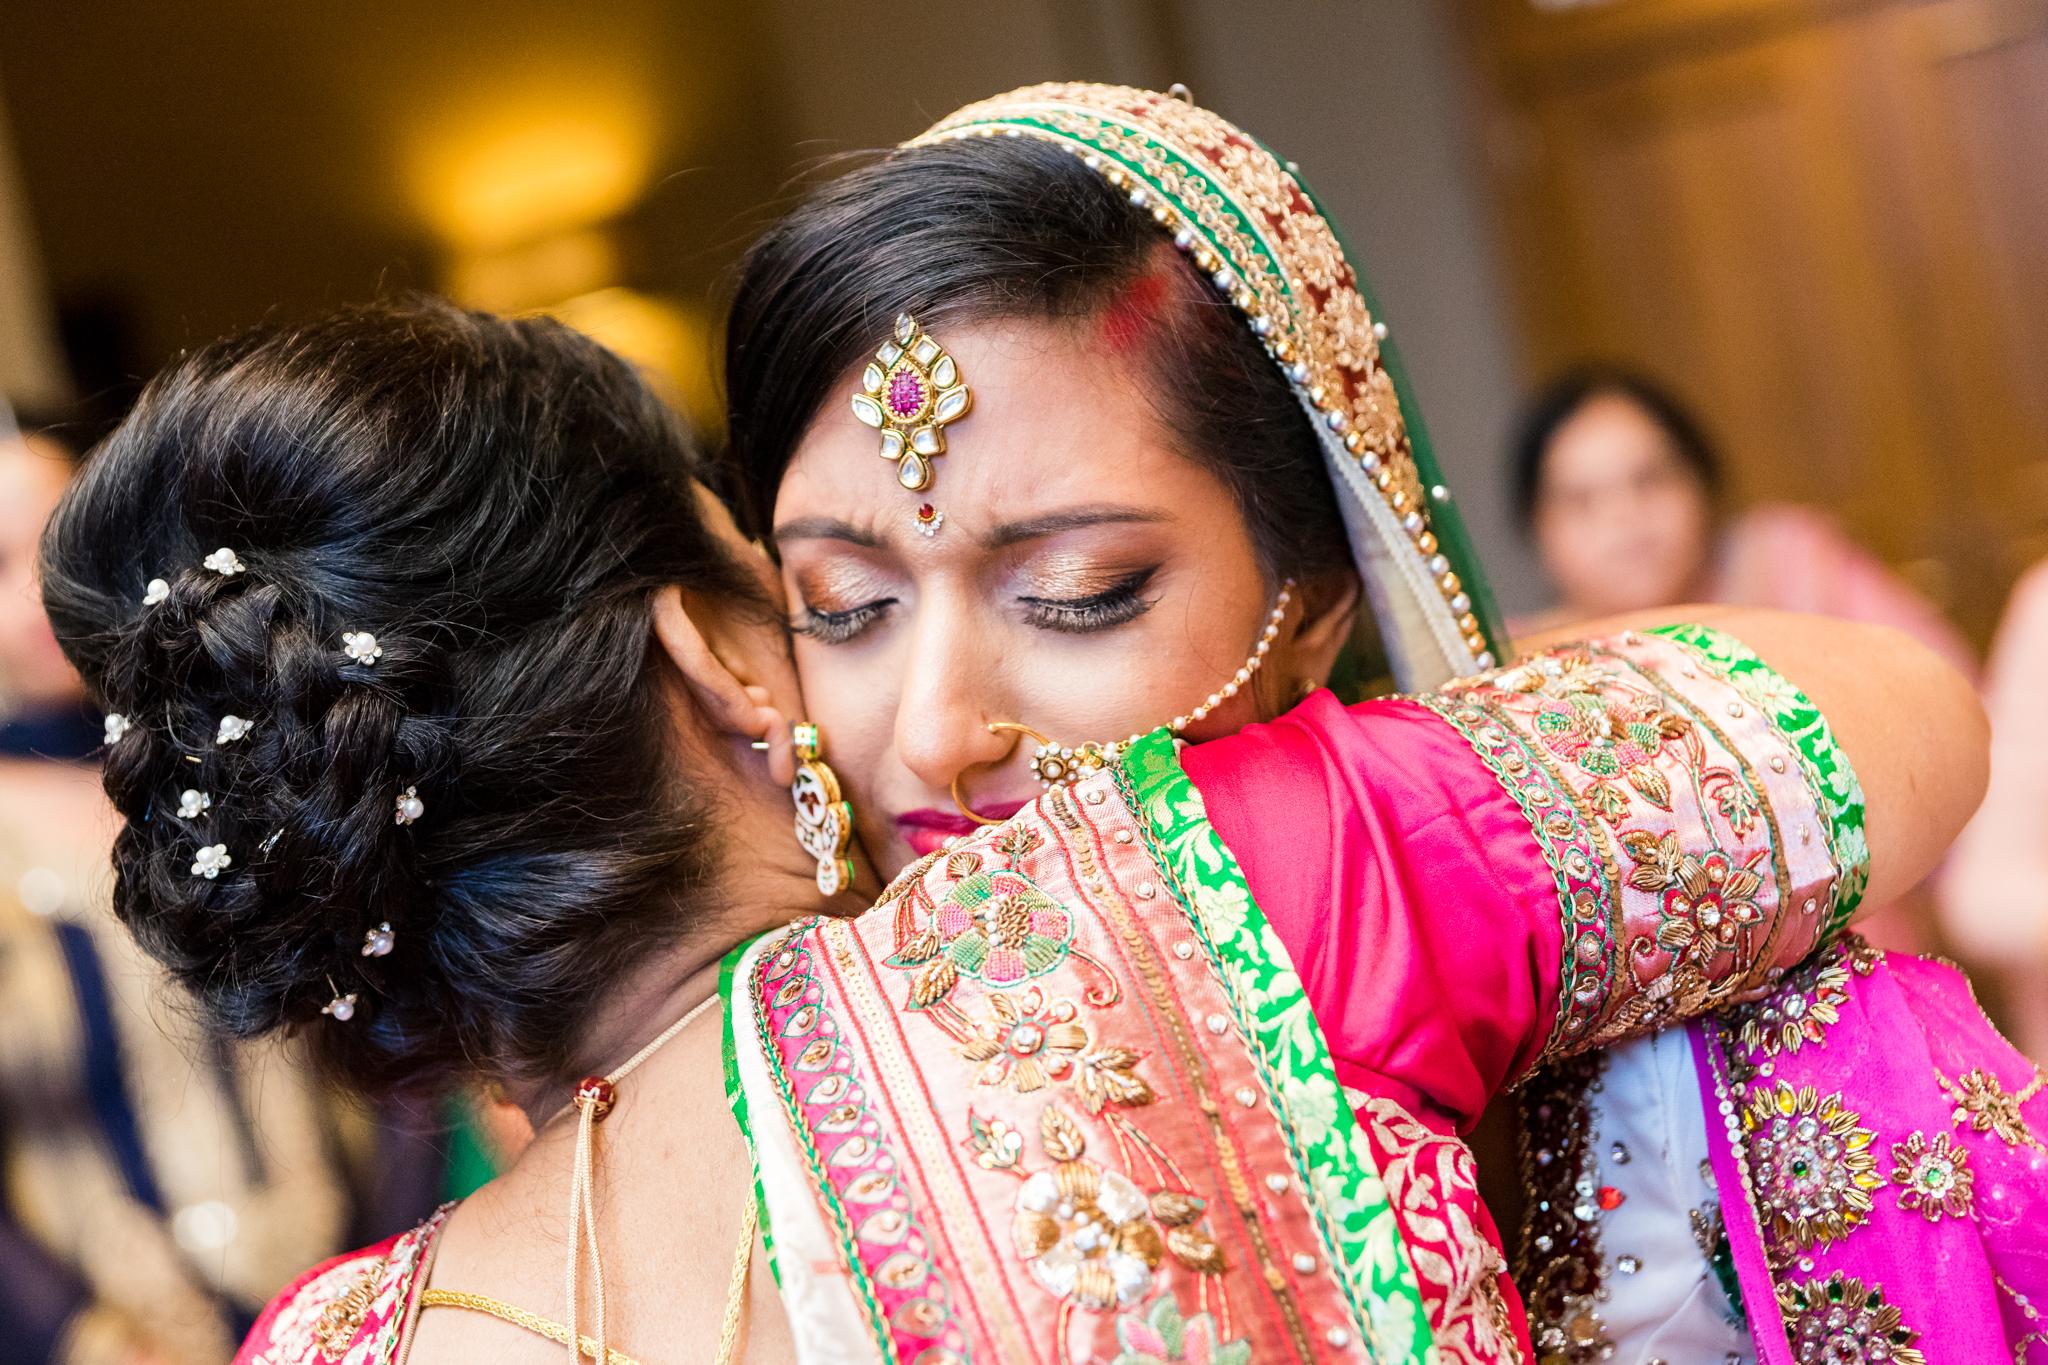 ReeyaAman-Wedding-Photography-www.MnMfoto.comMnMfoto-Krishna-Sajan-1307.jpg